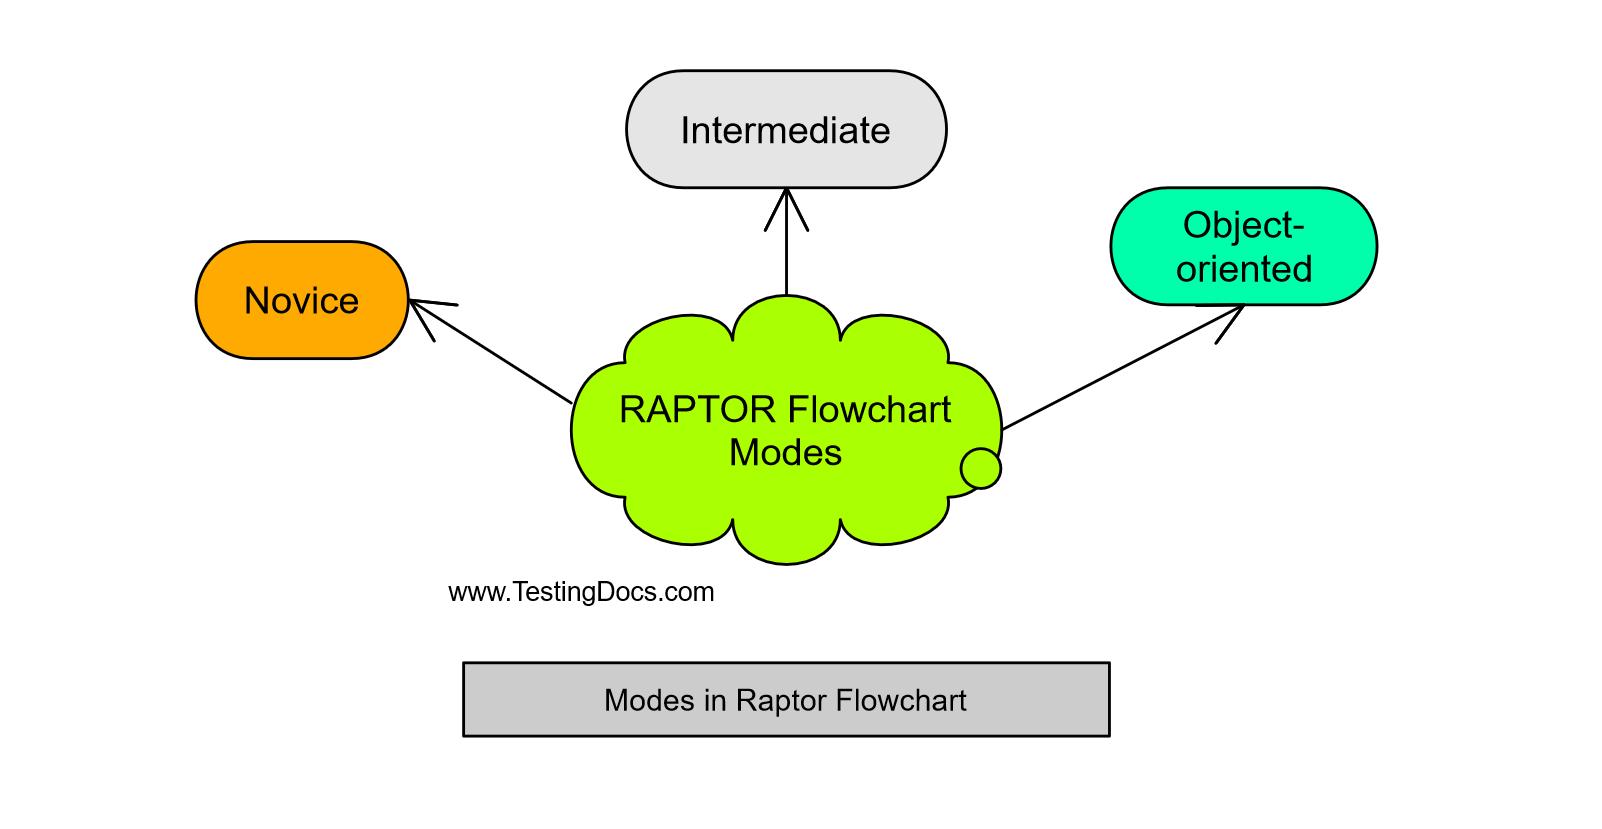 Modes in Raptor Flowchart